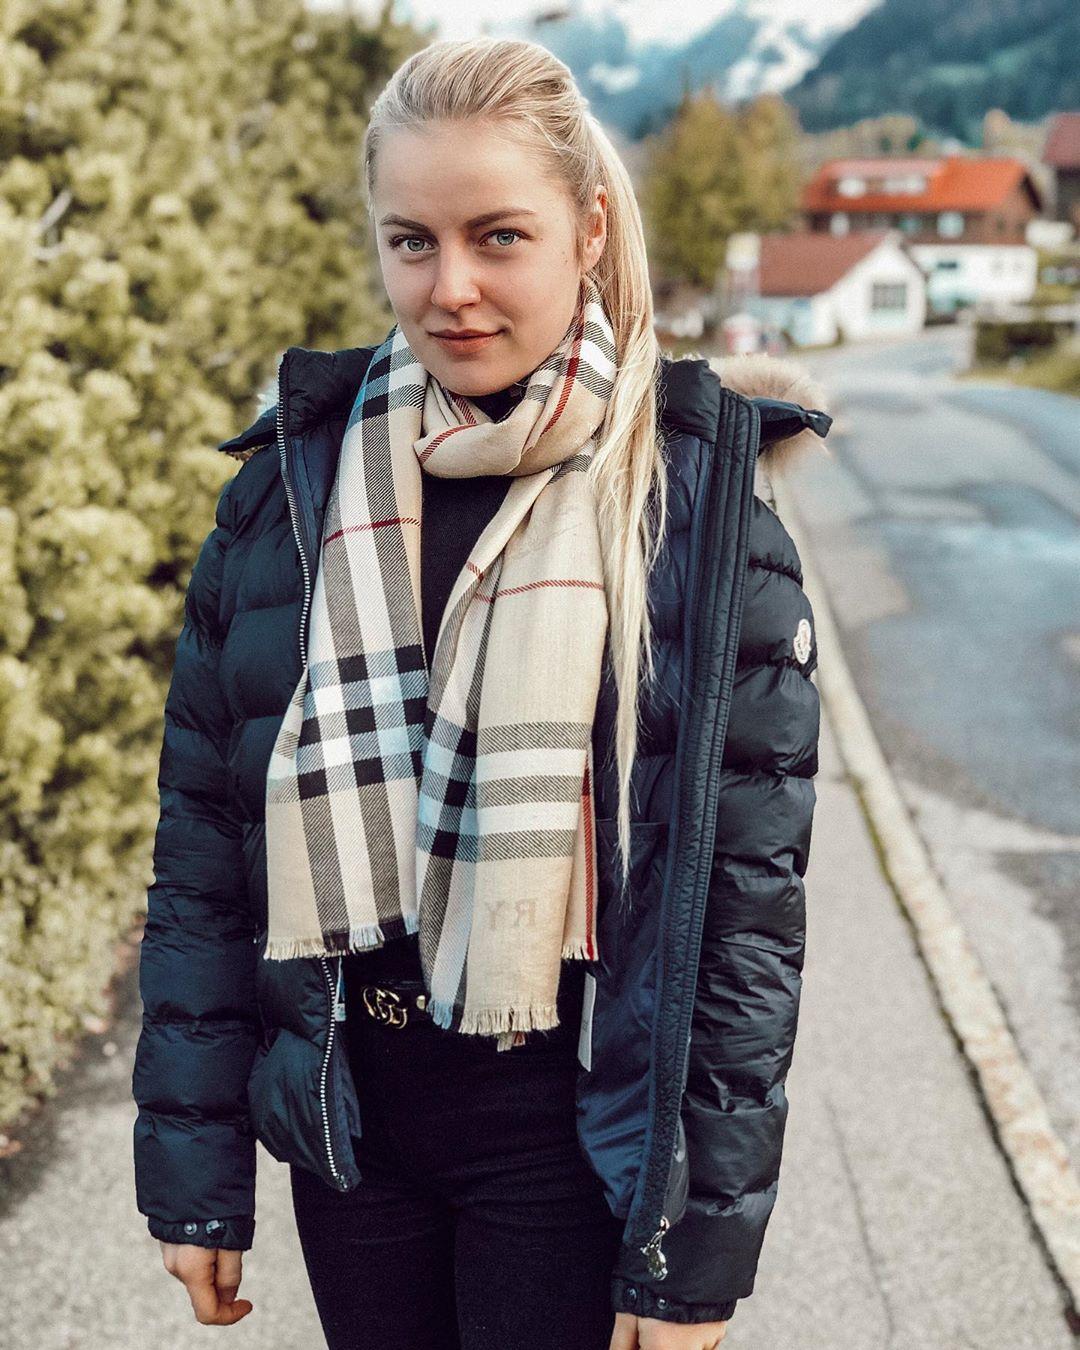 Julia-Durr-Wallpapers-Insta-Biography-10